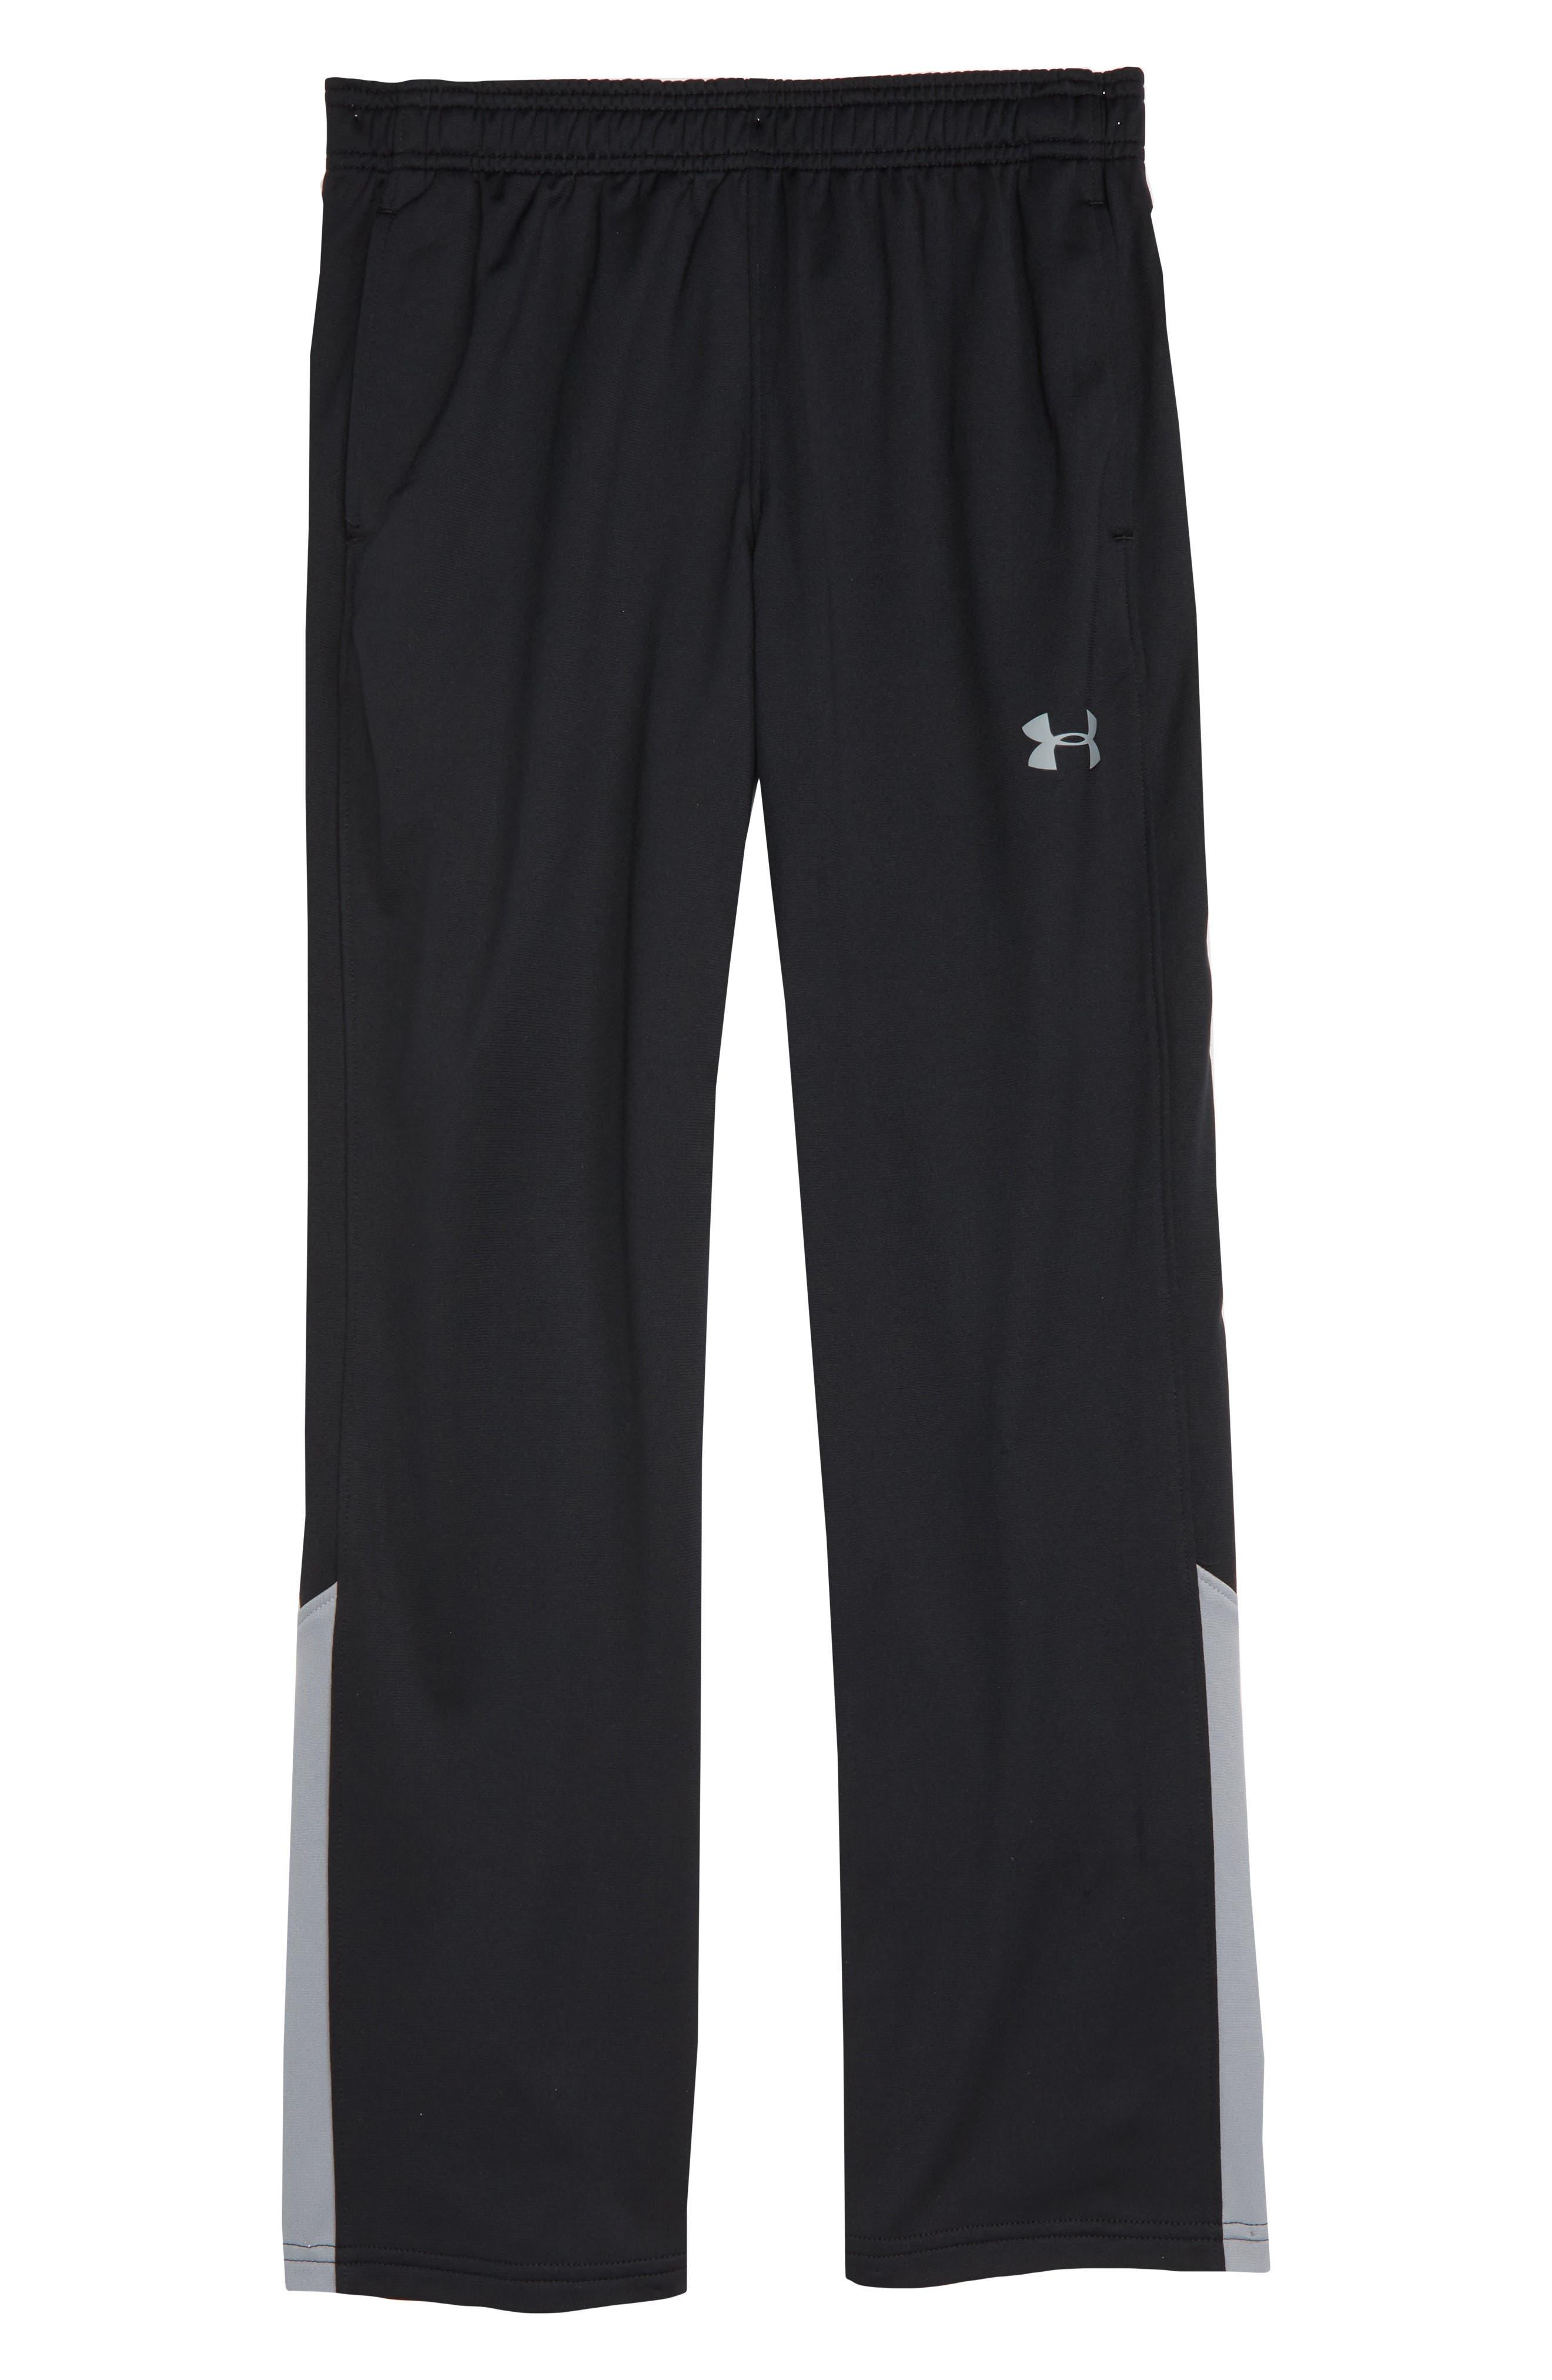 Boys Under Armour Brawler 20 Sweatpants